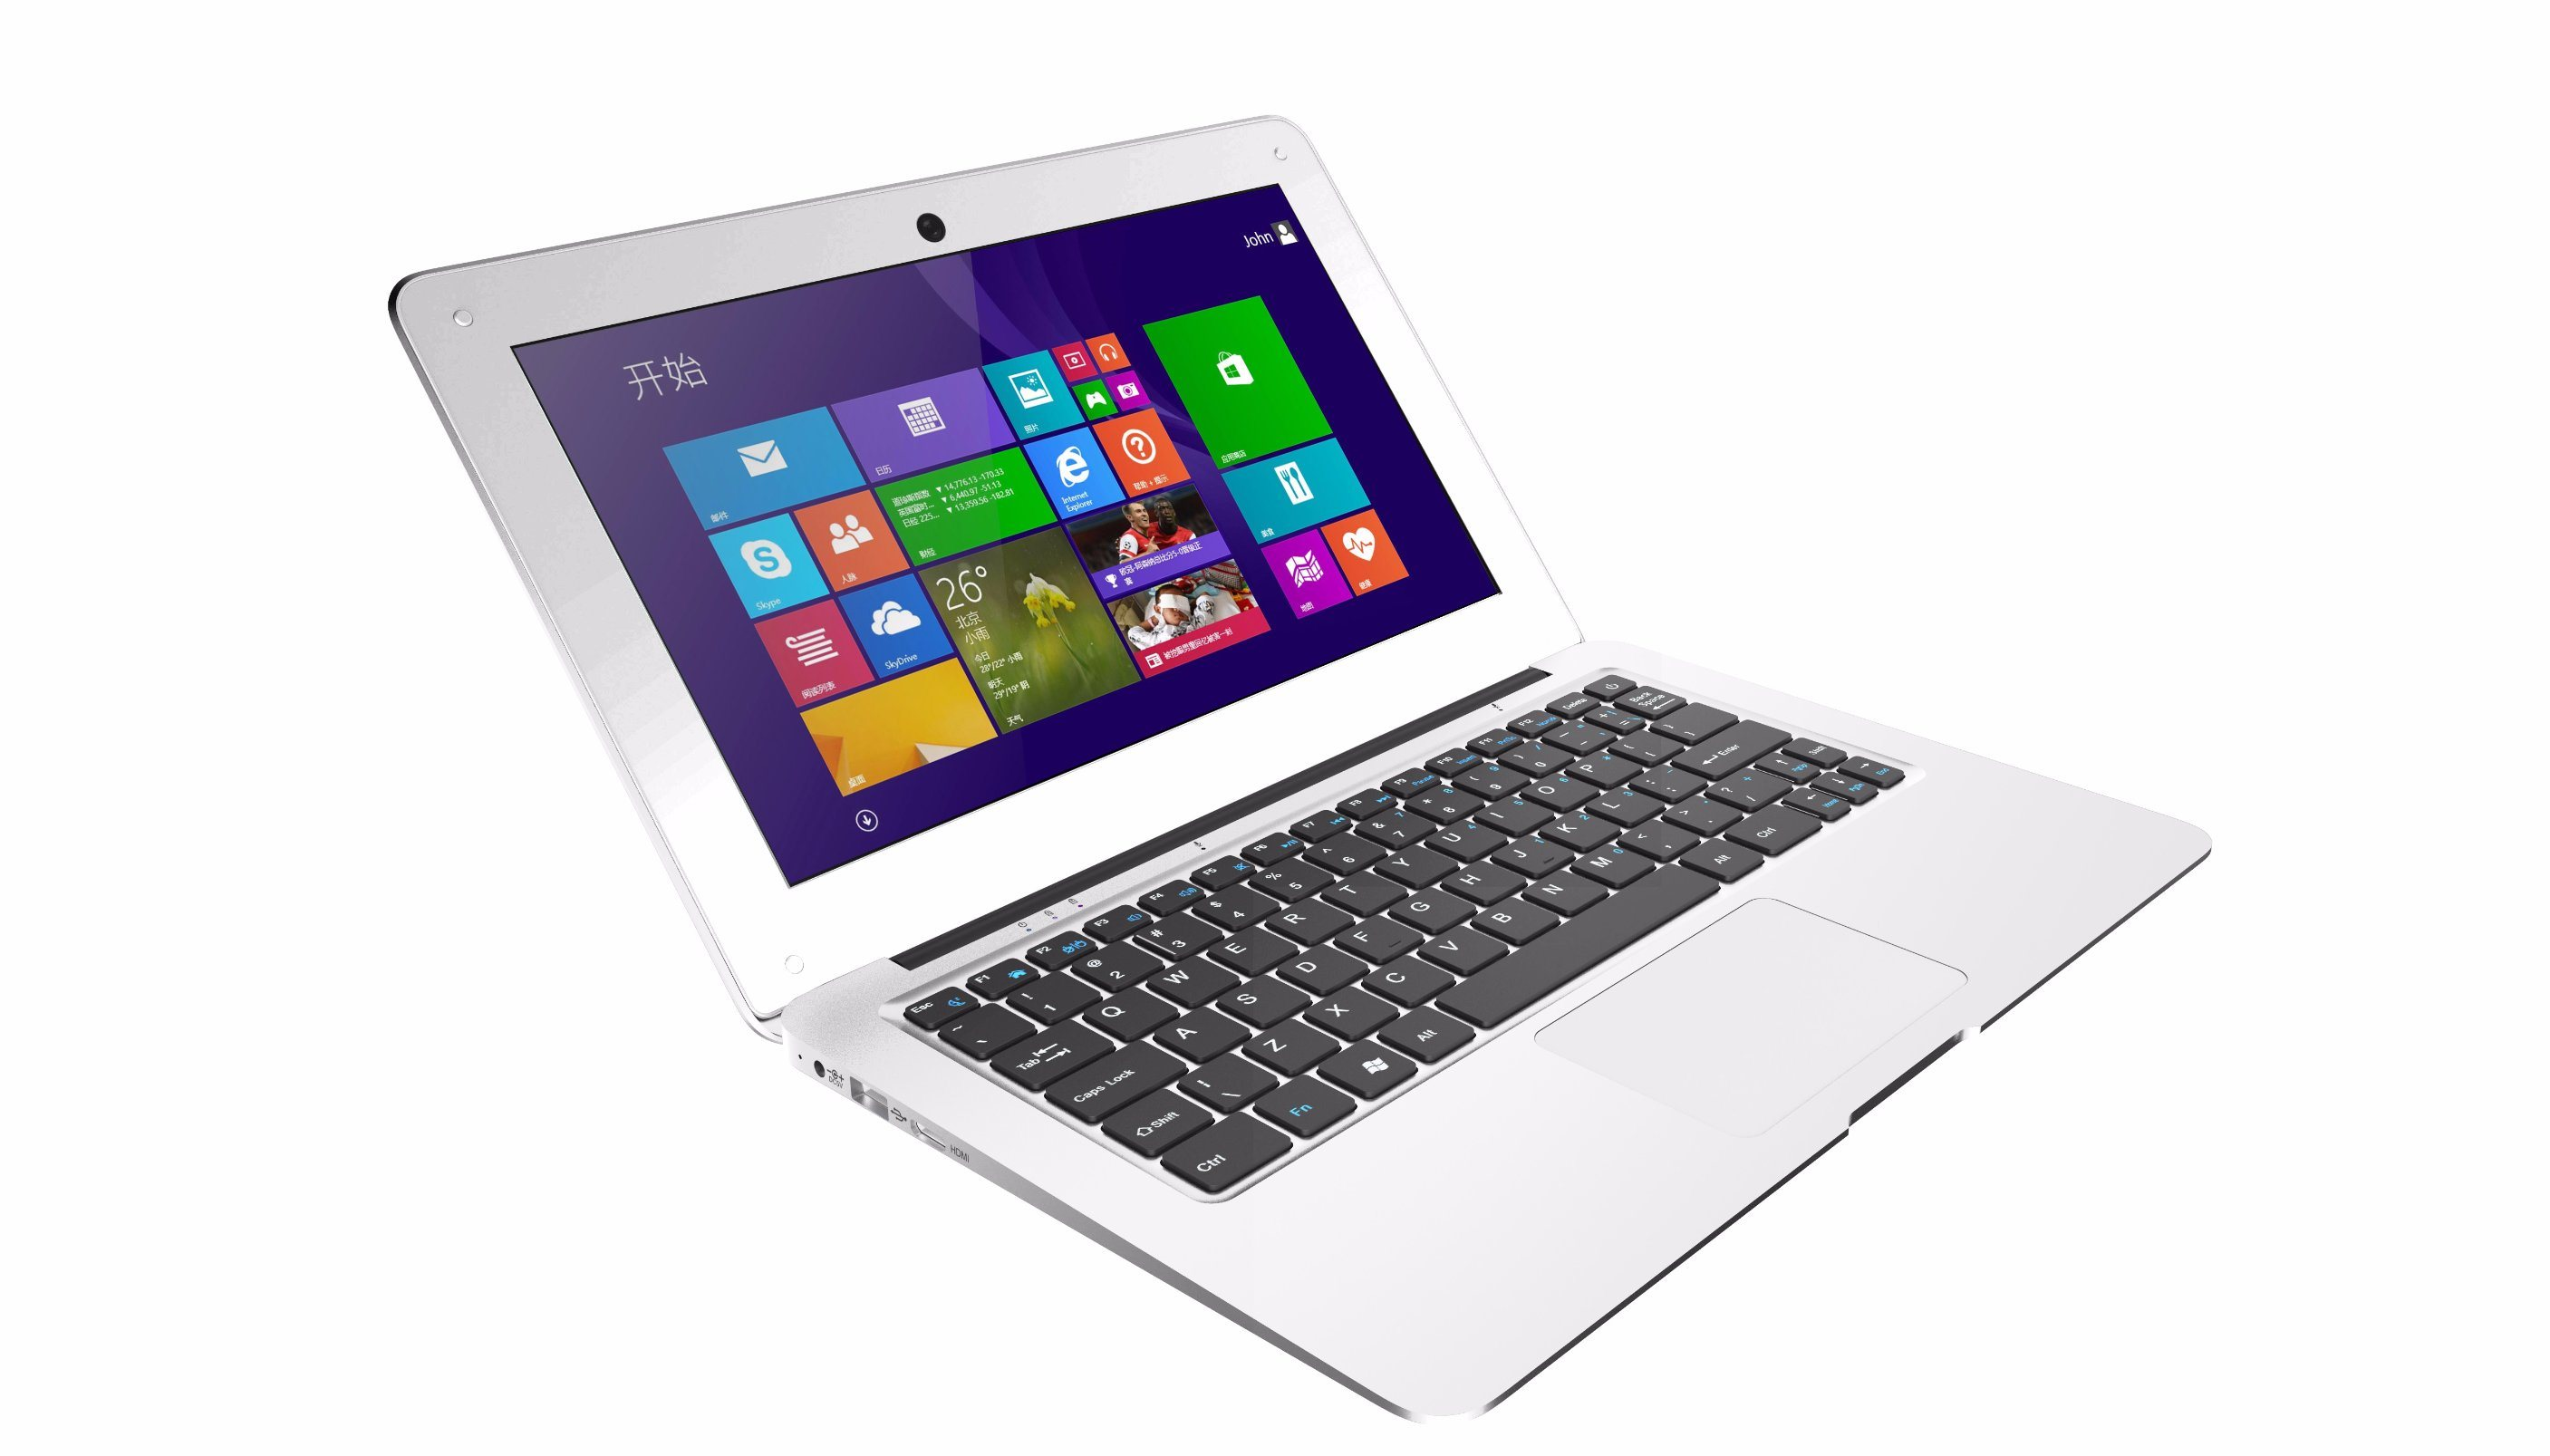 Hot Sale 11.6 Inch Intel Atom Mini Laptop Computer